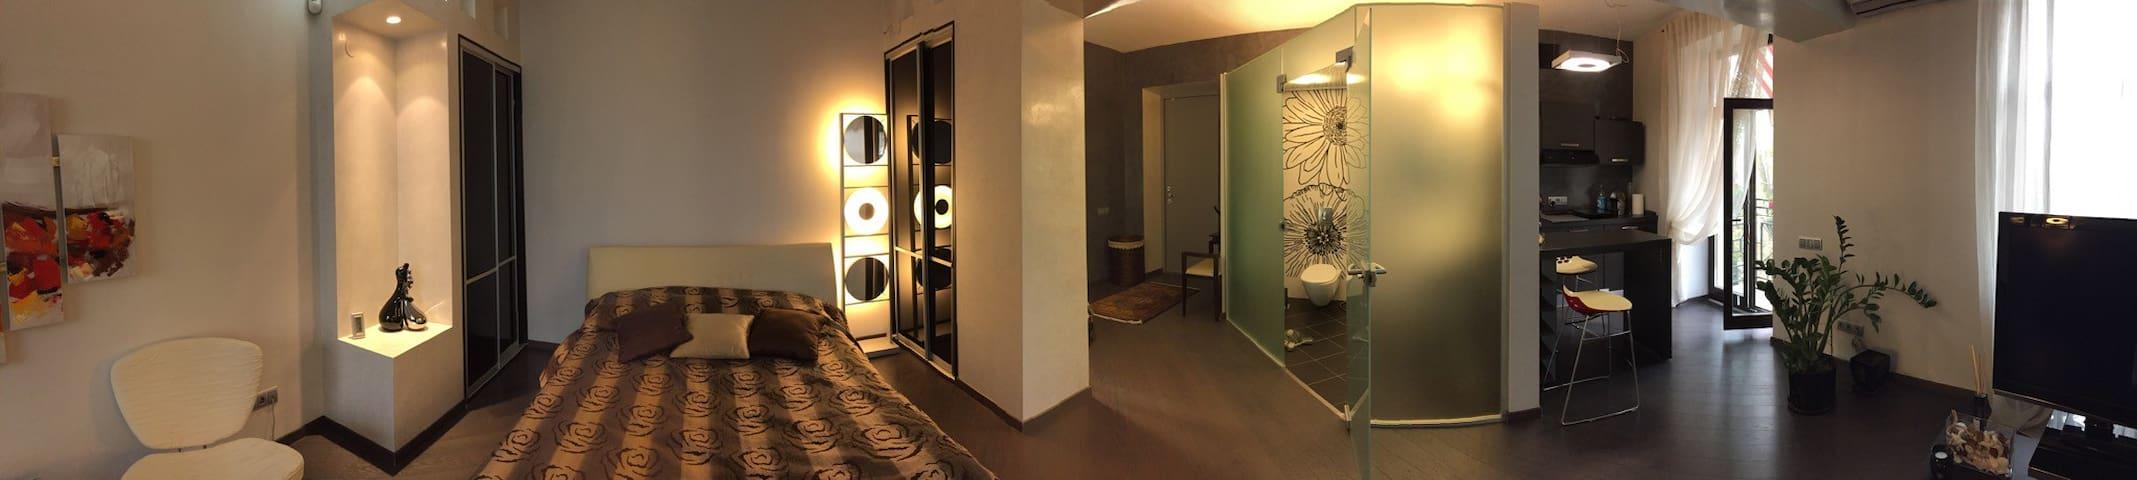 Apartment N1 - Minsk